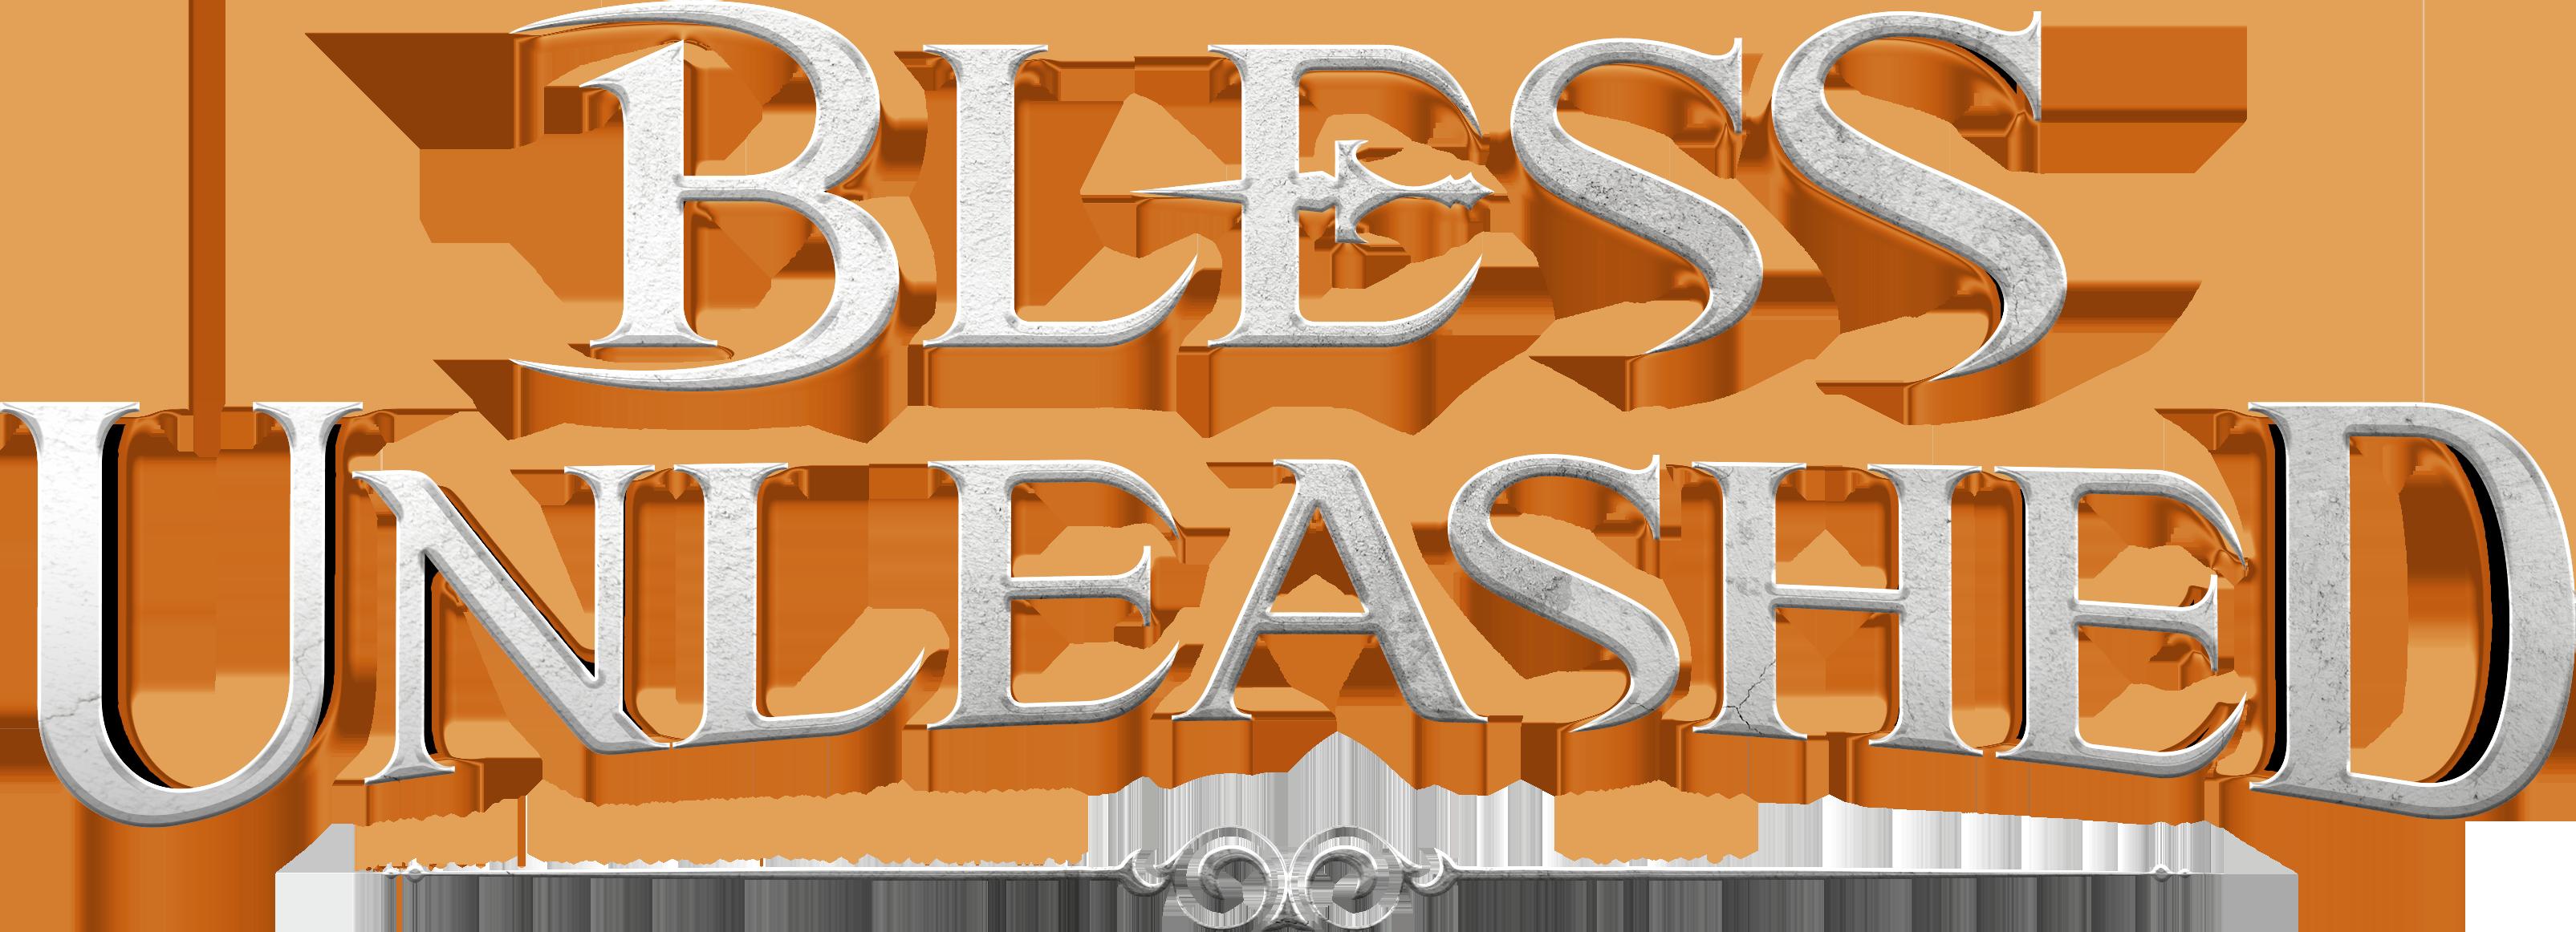 Логотип - Bless Unleashed